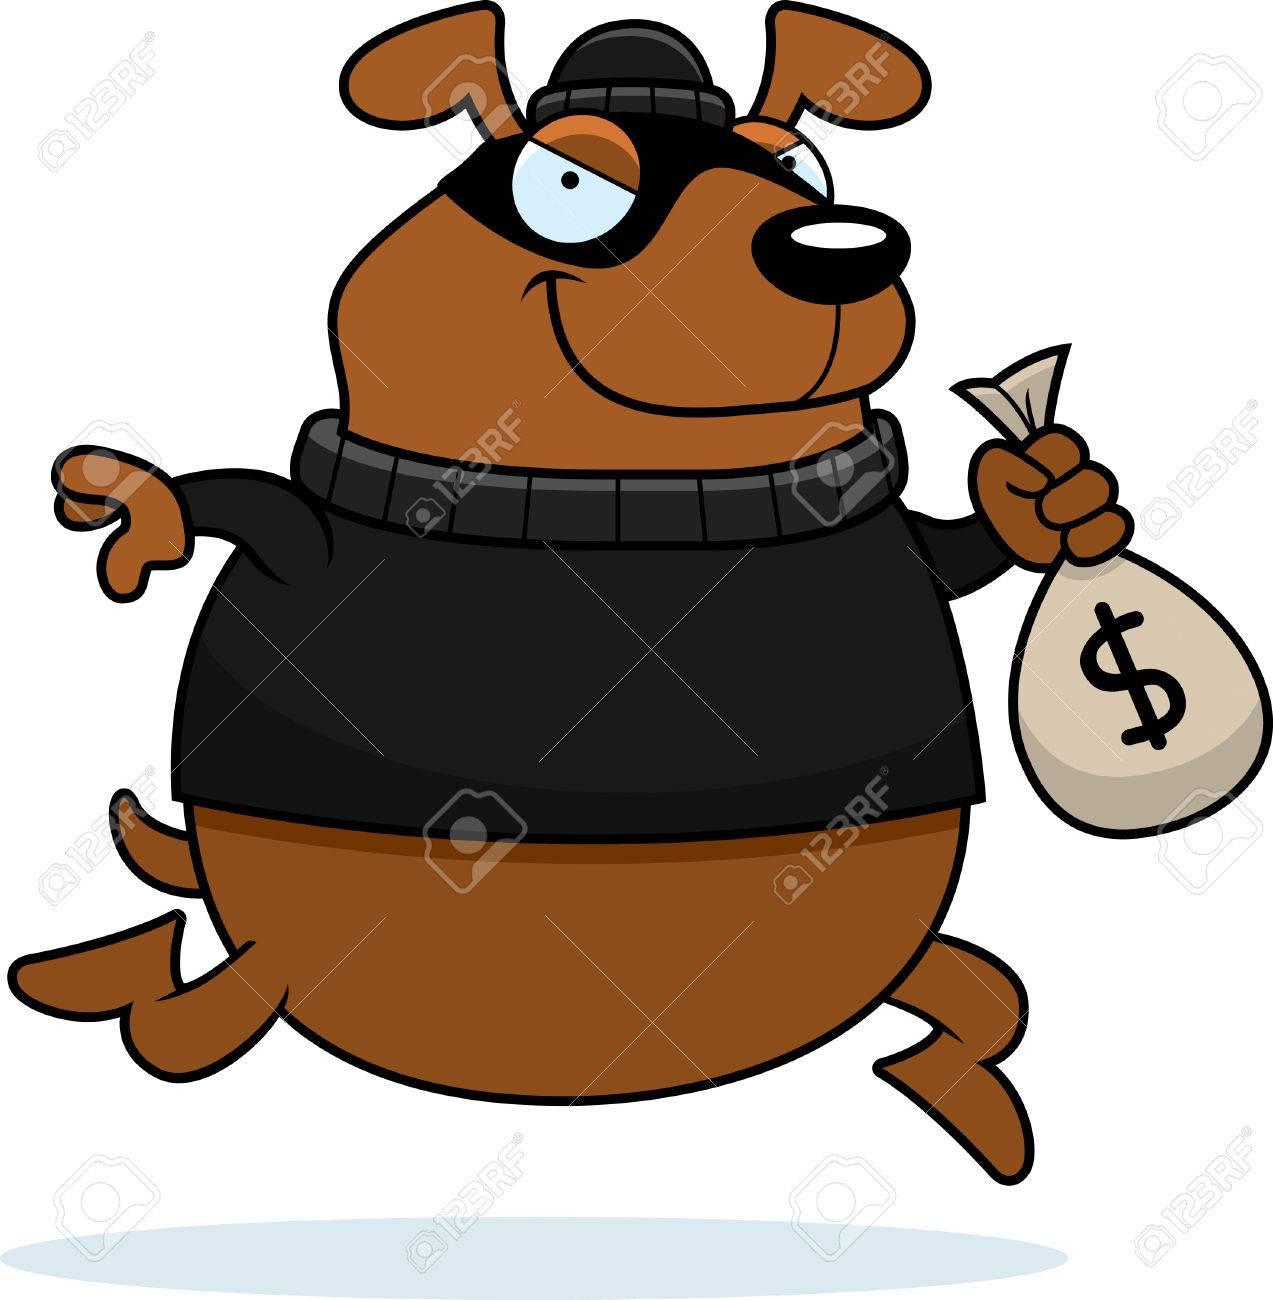 a cartoon illustration of a dog burglar stealing money royalty free rh 123rf com burglar clipart black and white burglar clipart black and white